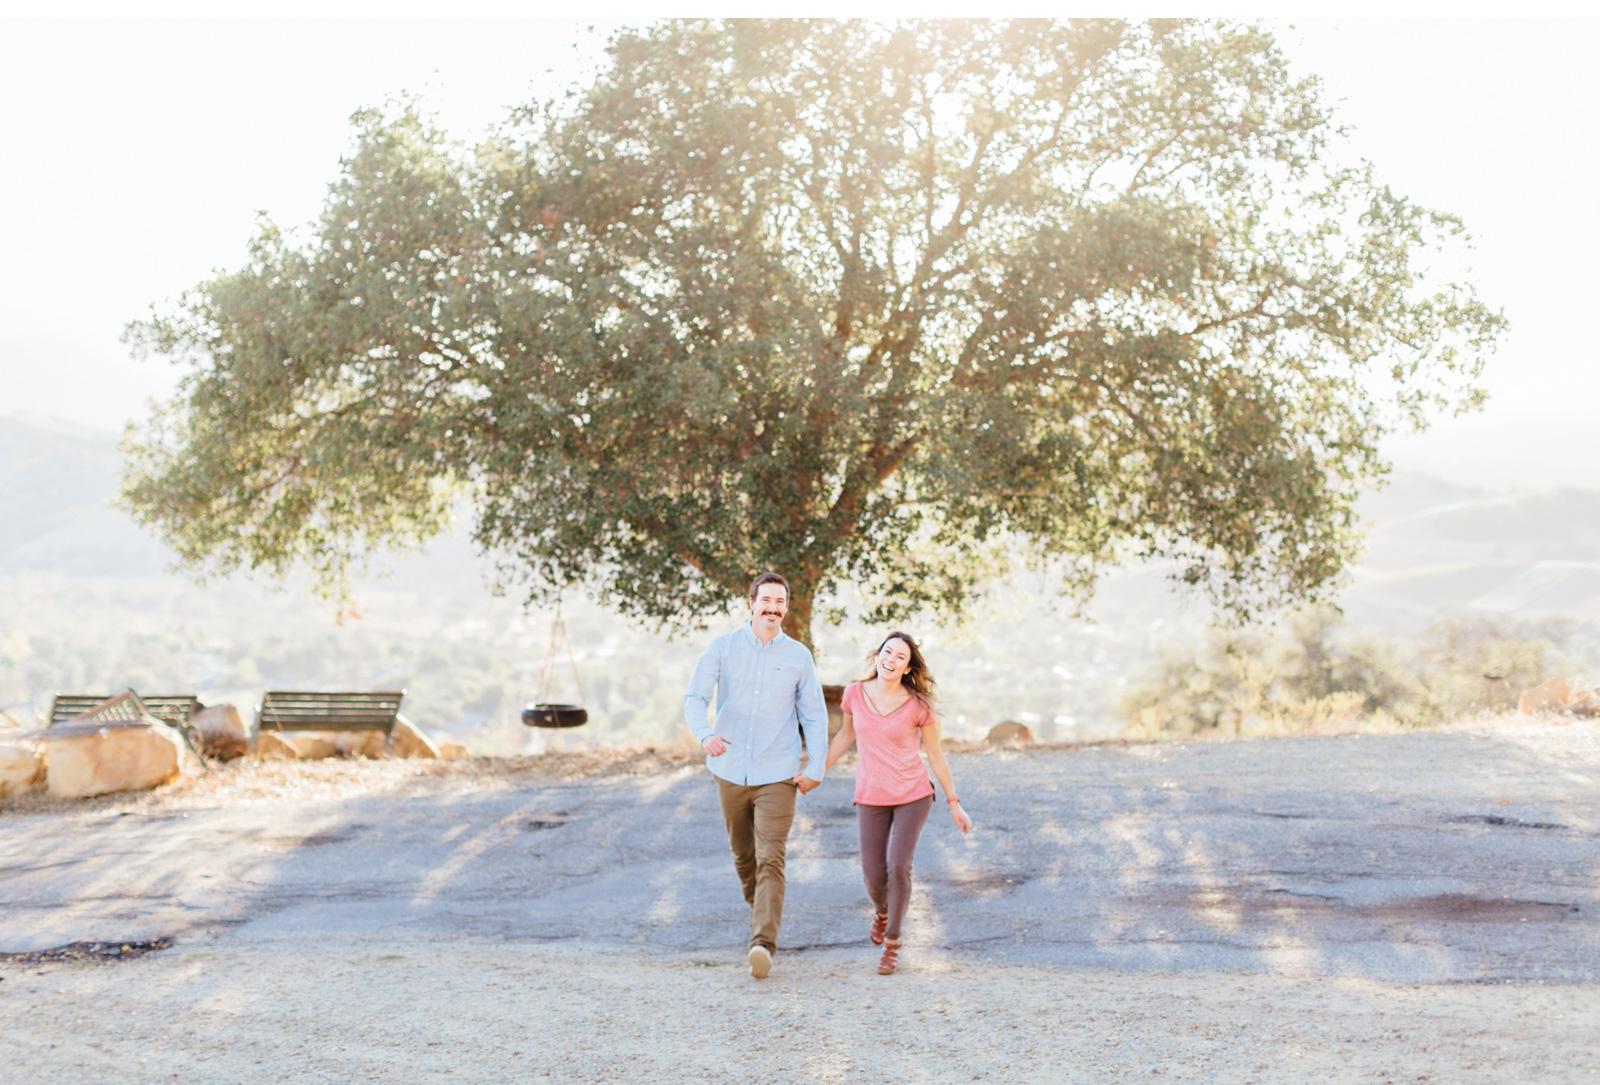 San-Luis-Obispo-Wedding-Photographer-Natalie-Schutt-Photography_20.jpg